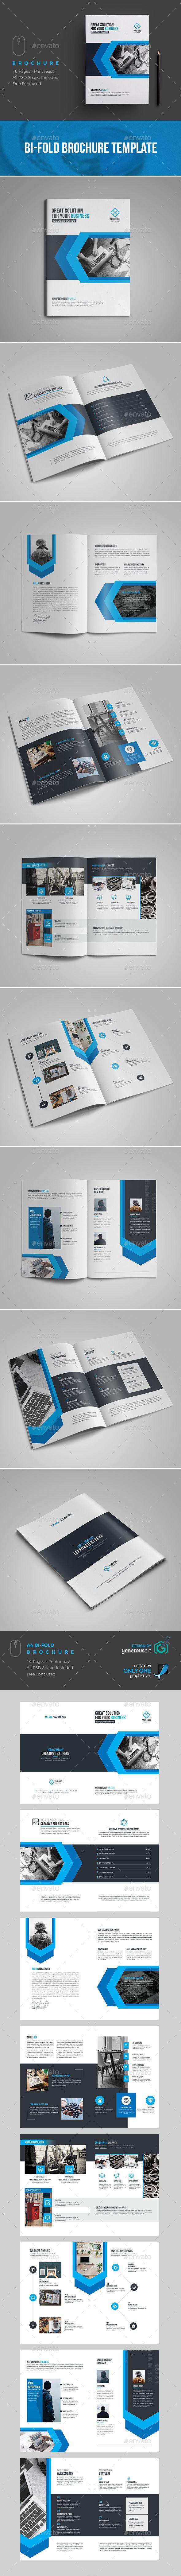 #Business #Brochure #Template - Brochures Print Templates Download here:  https://graphicriver.net/item/business-brochure-template/19405304?ref=alena994